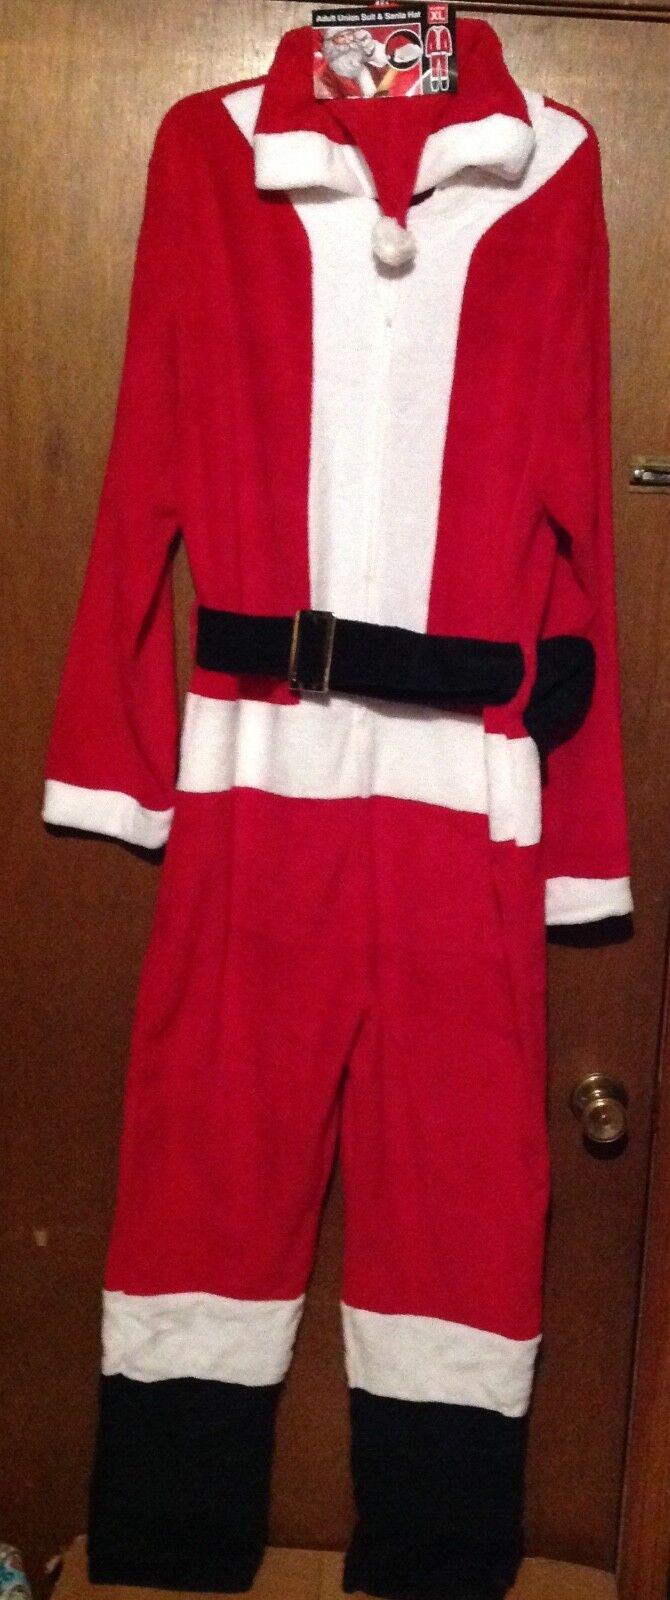 SANTA CHRISTMAS 2 piece UNION SUIT PAJAMA XL and Santa HAT ADULT  XL. Men's NEW